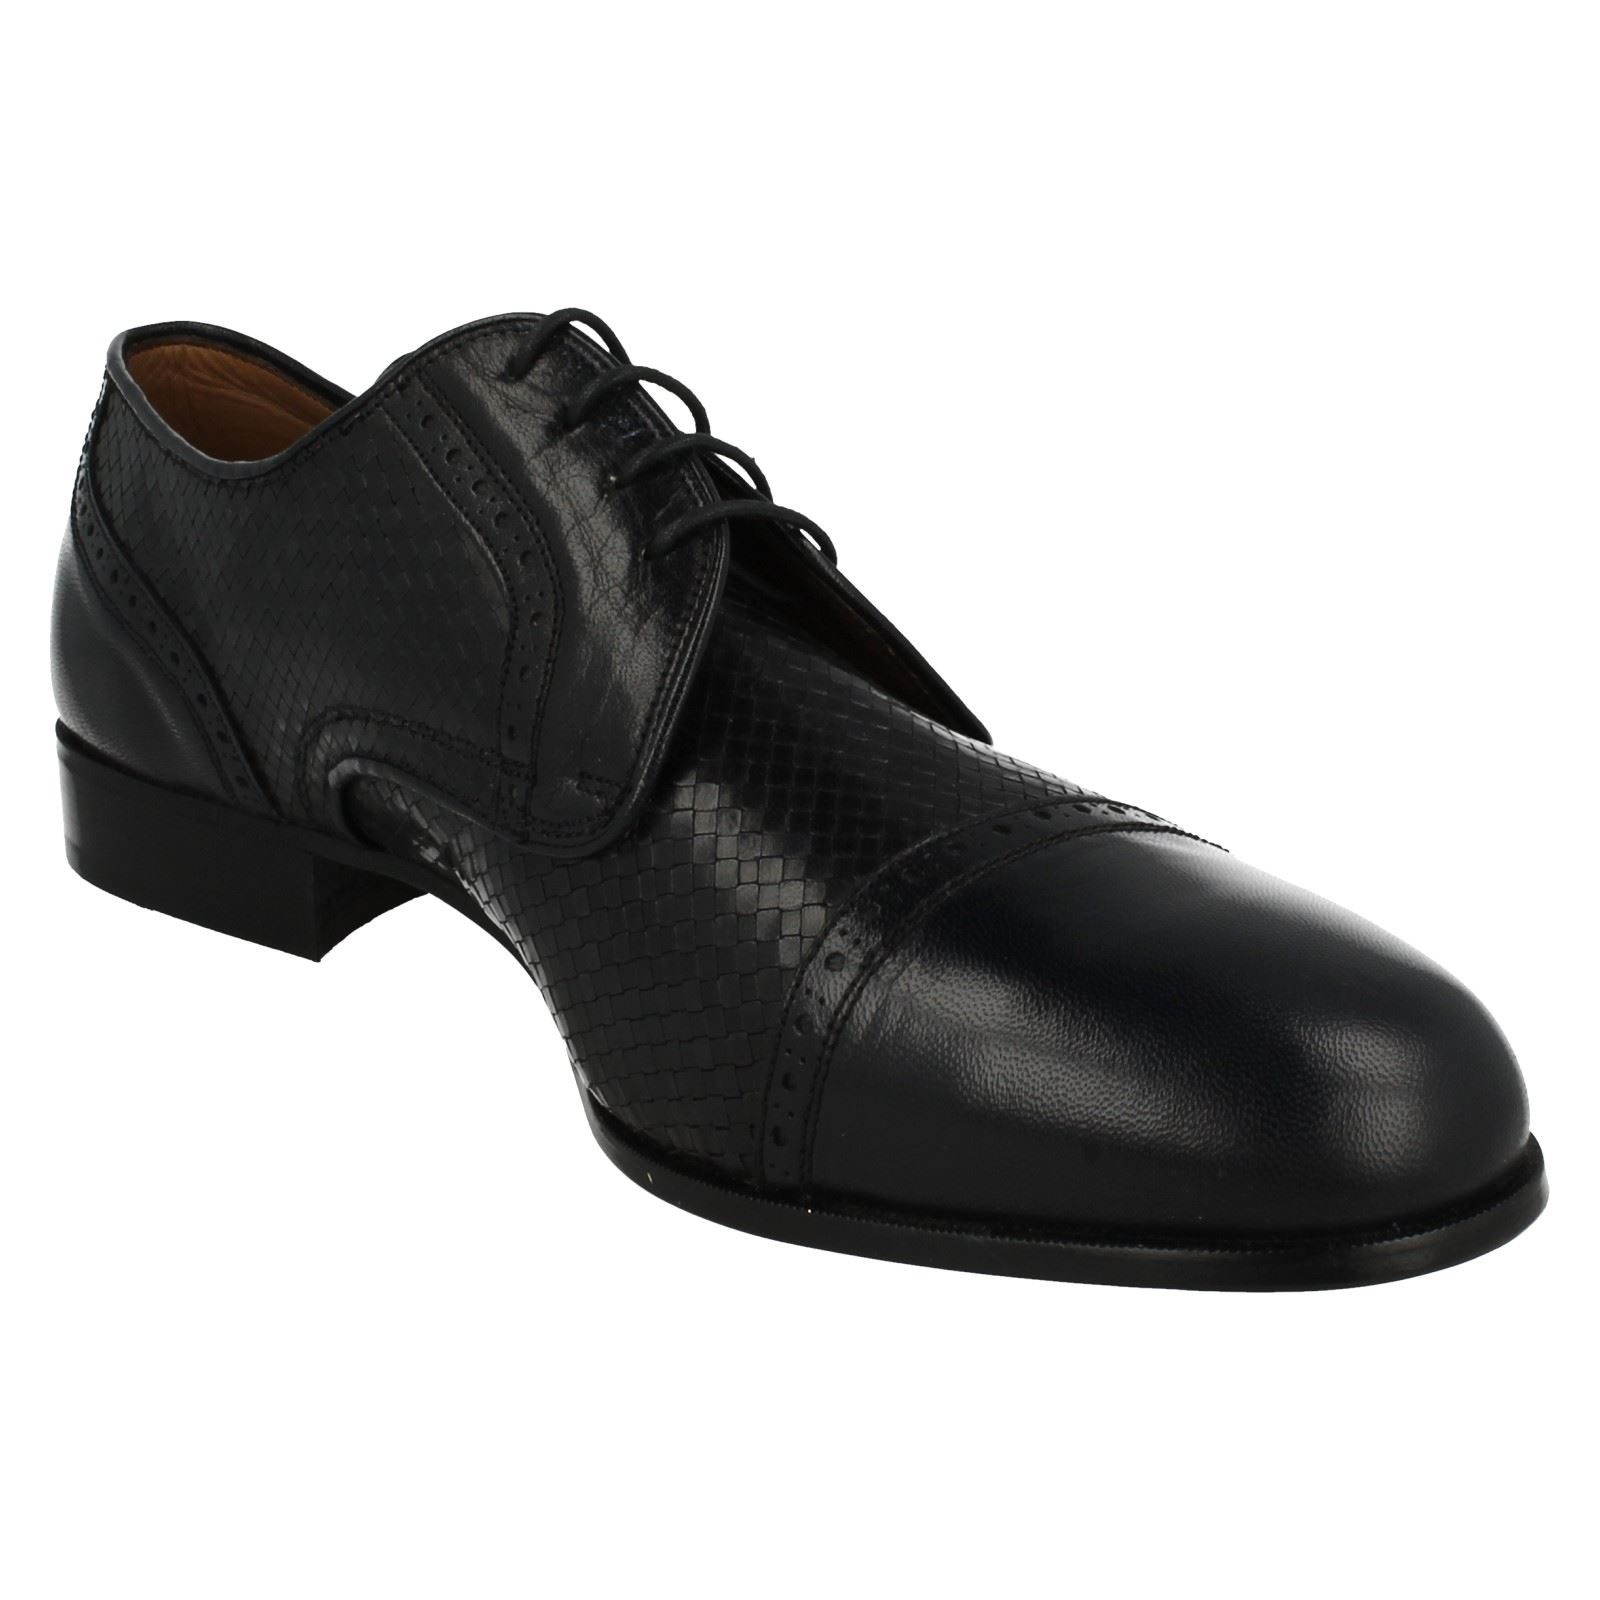 Herren Grenson Smart Schuhes 'Geno' 'Geno' 'Geno' 3a36fb